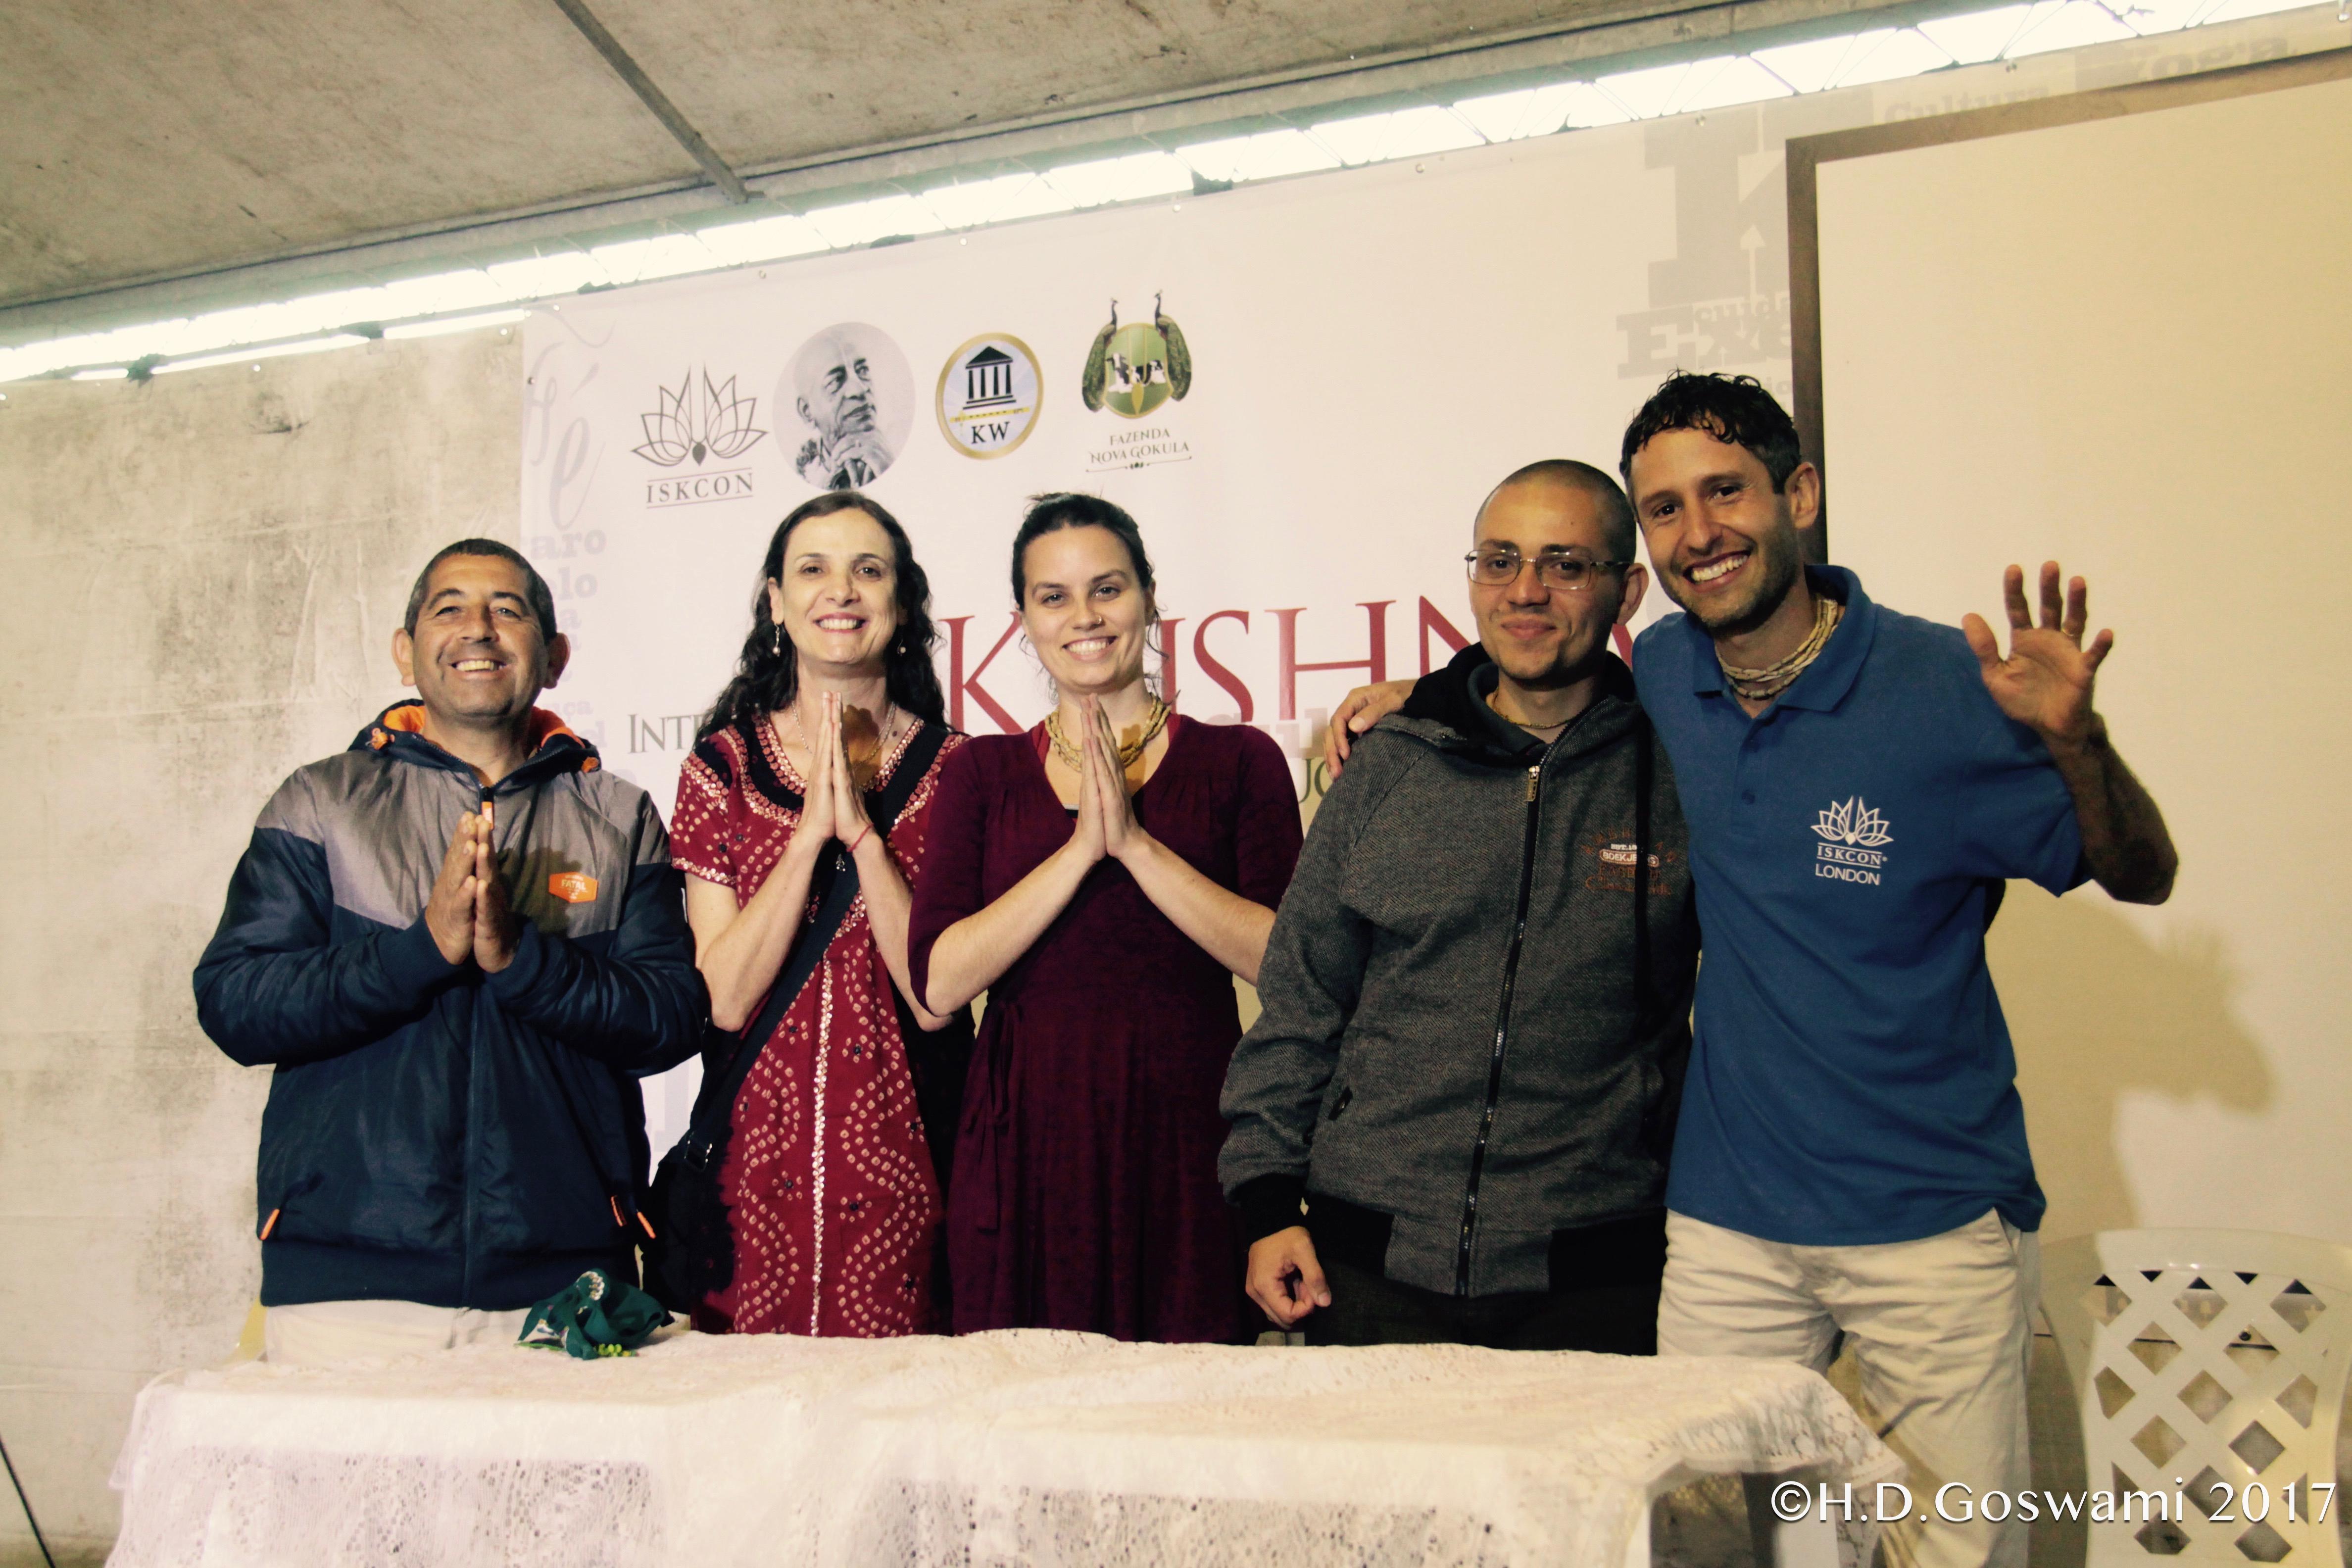 Krishna West Festival 2017